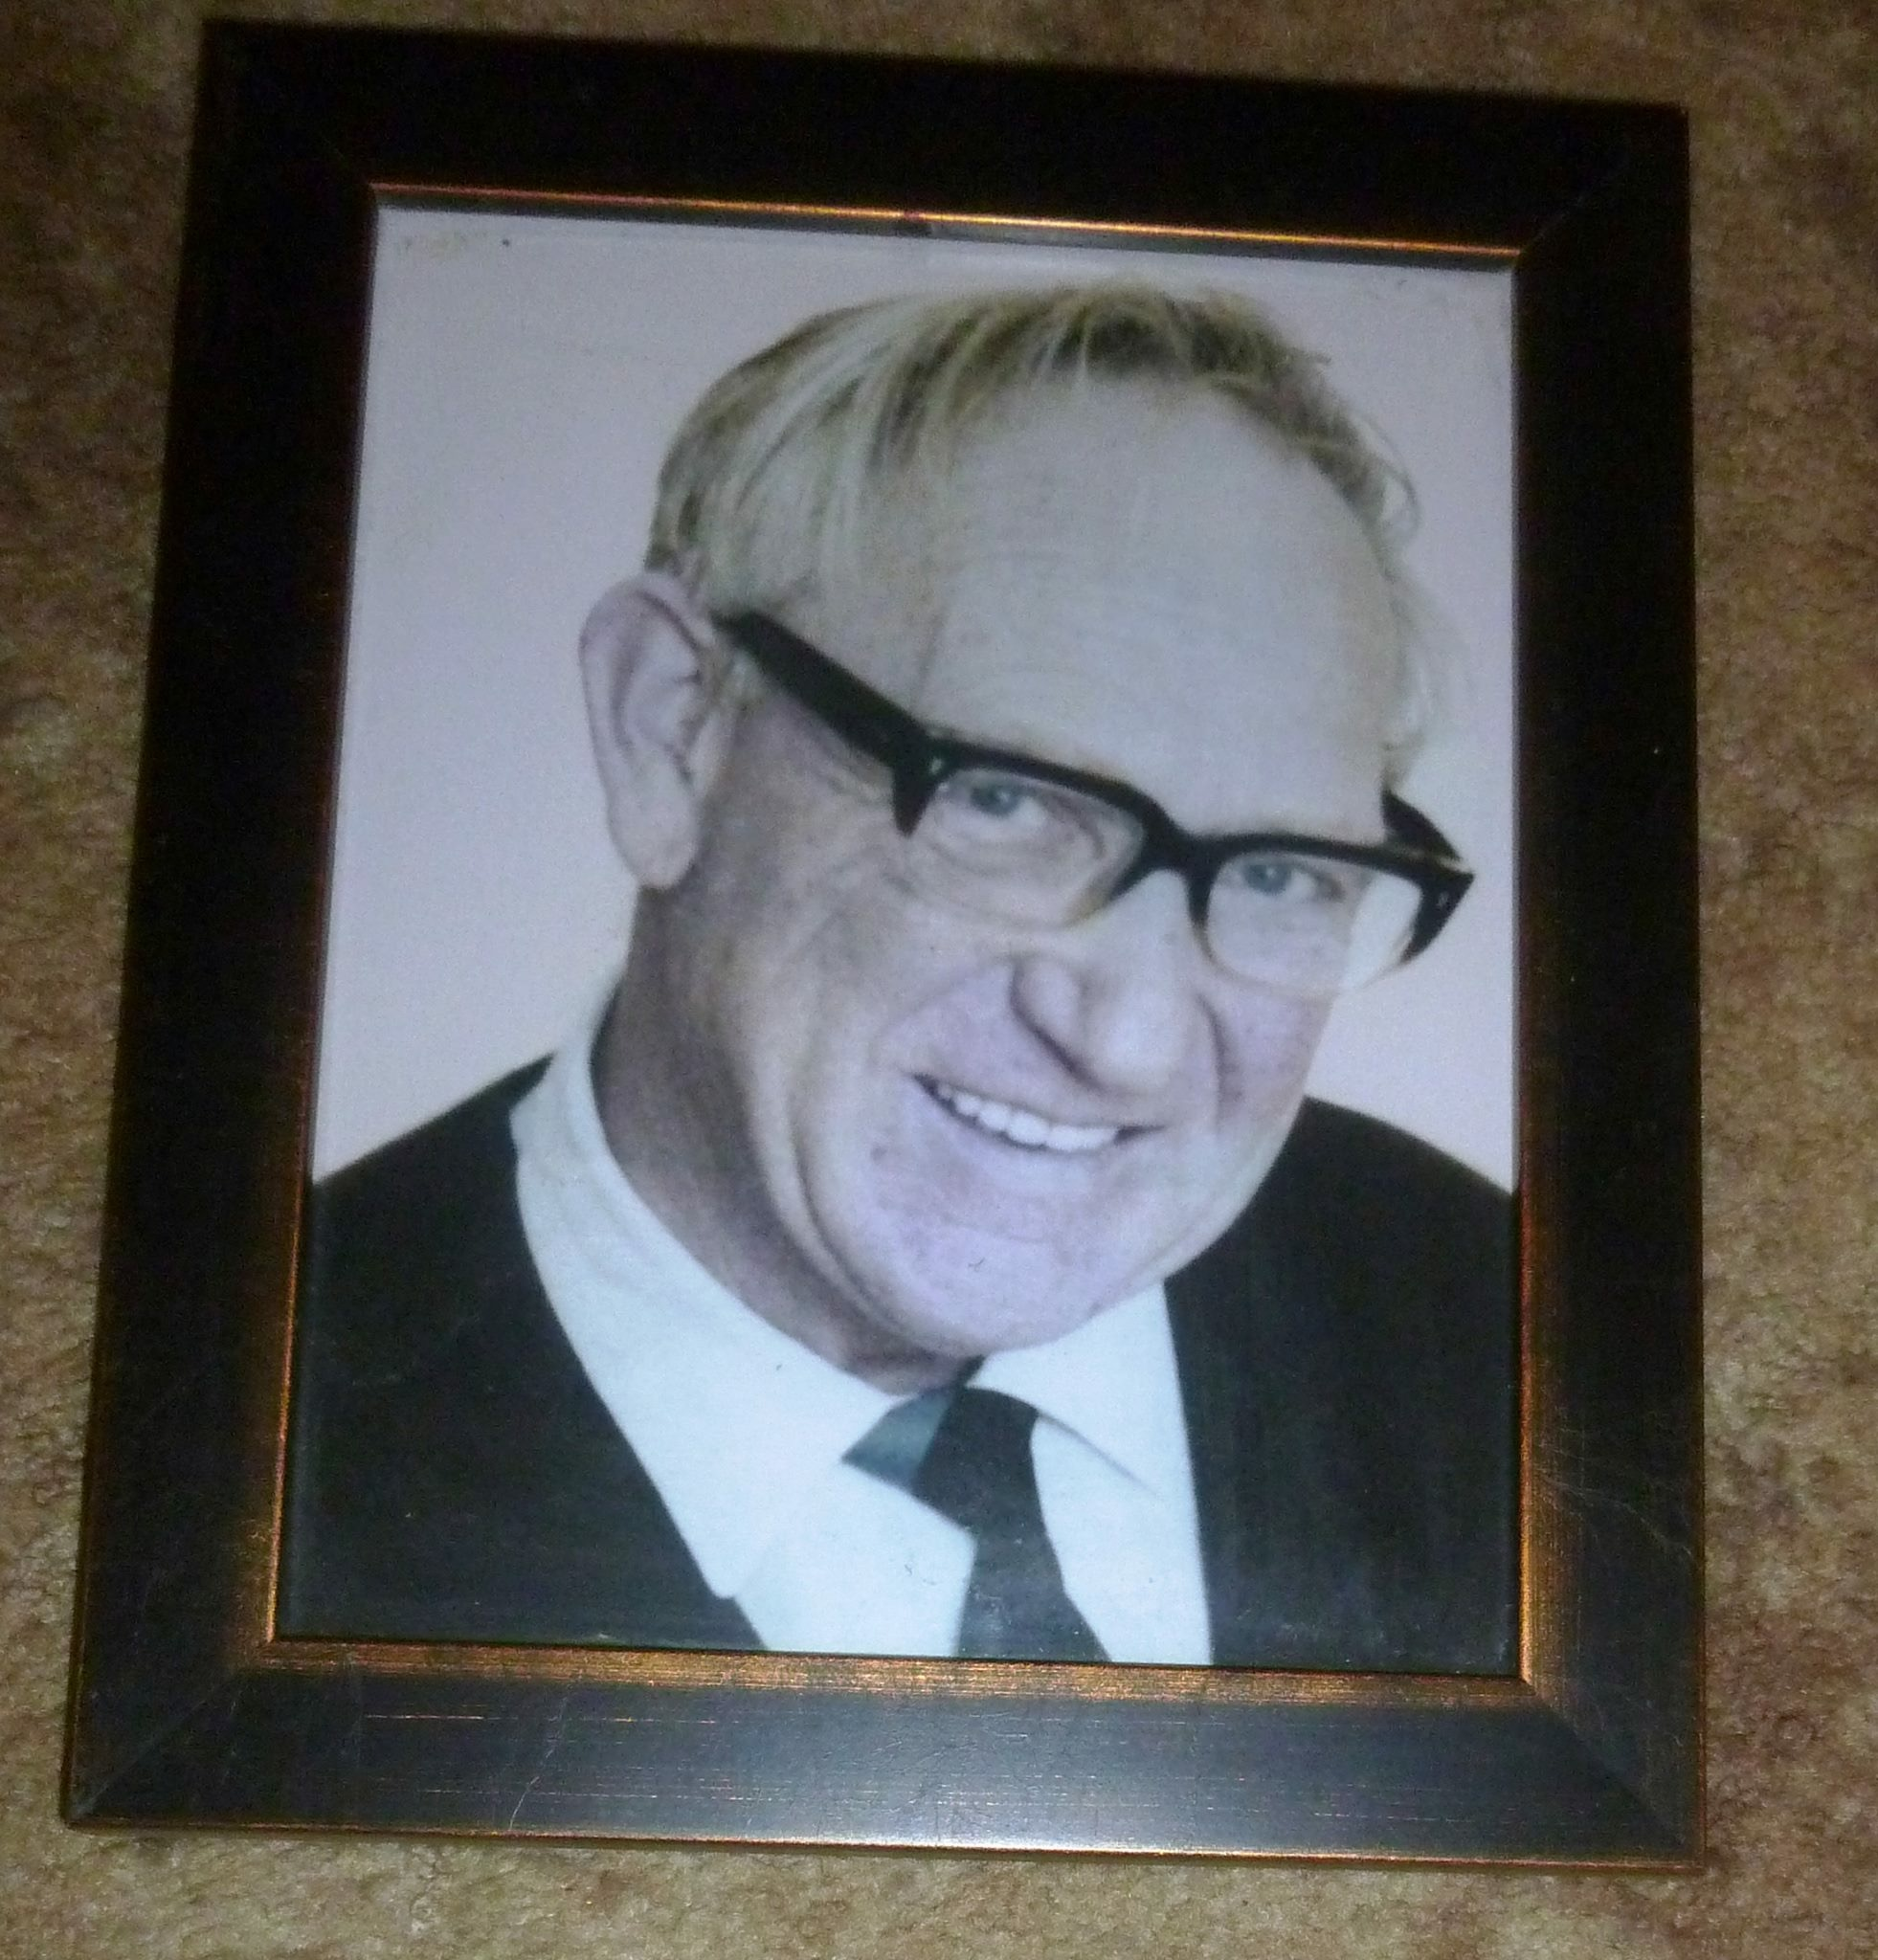 My Pa, Arthur.